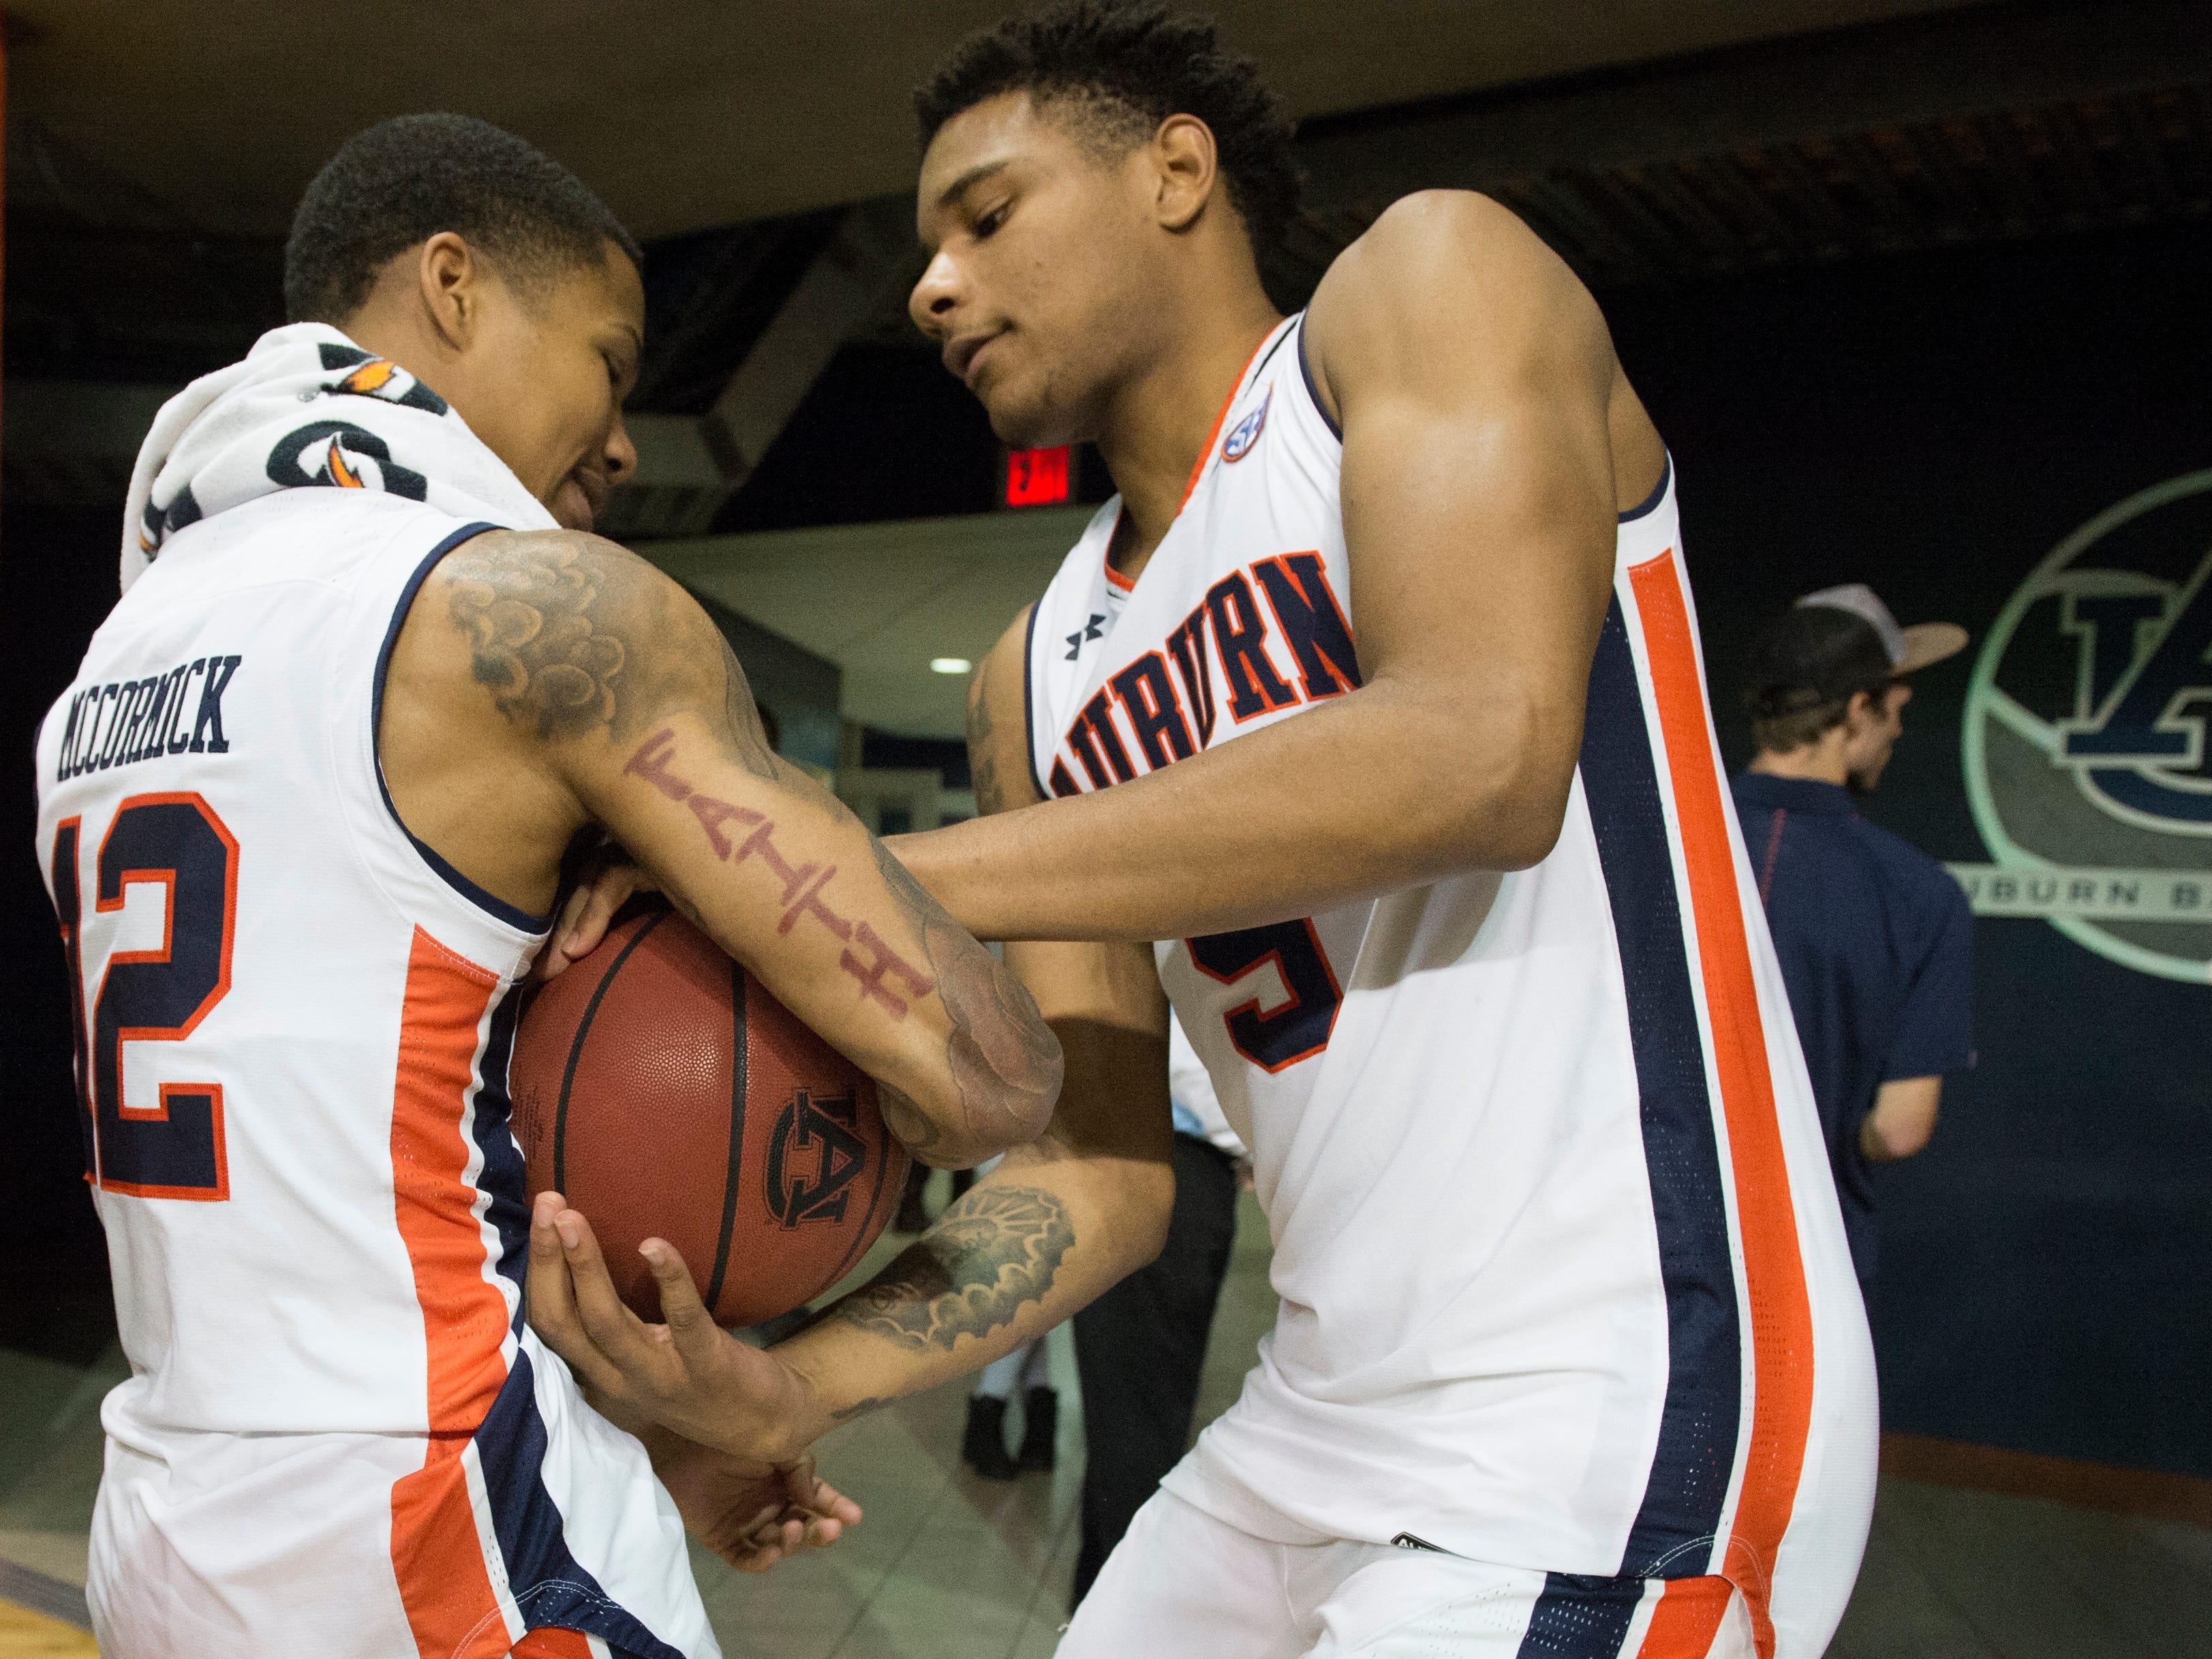 Auburn guard J'Von McCormick (12) and Chuma Okeke (5) fight over a ball as they walk off the court at Auburn Arena in Auburn, Ala., on Wednesday, Nov. 28, 2018. Auburn defeated Saint Peter's 99-49.